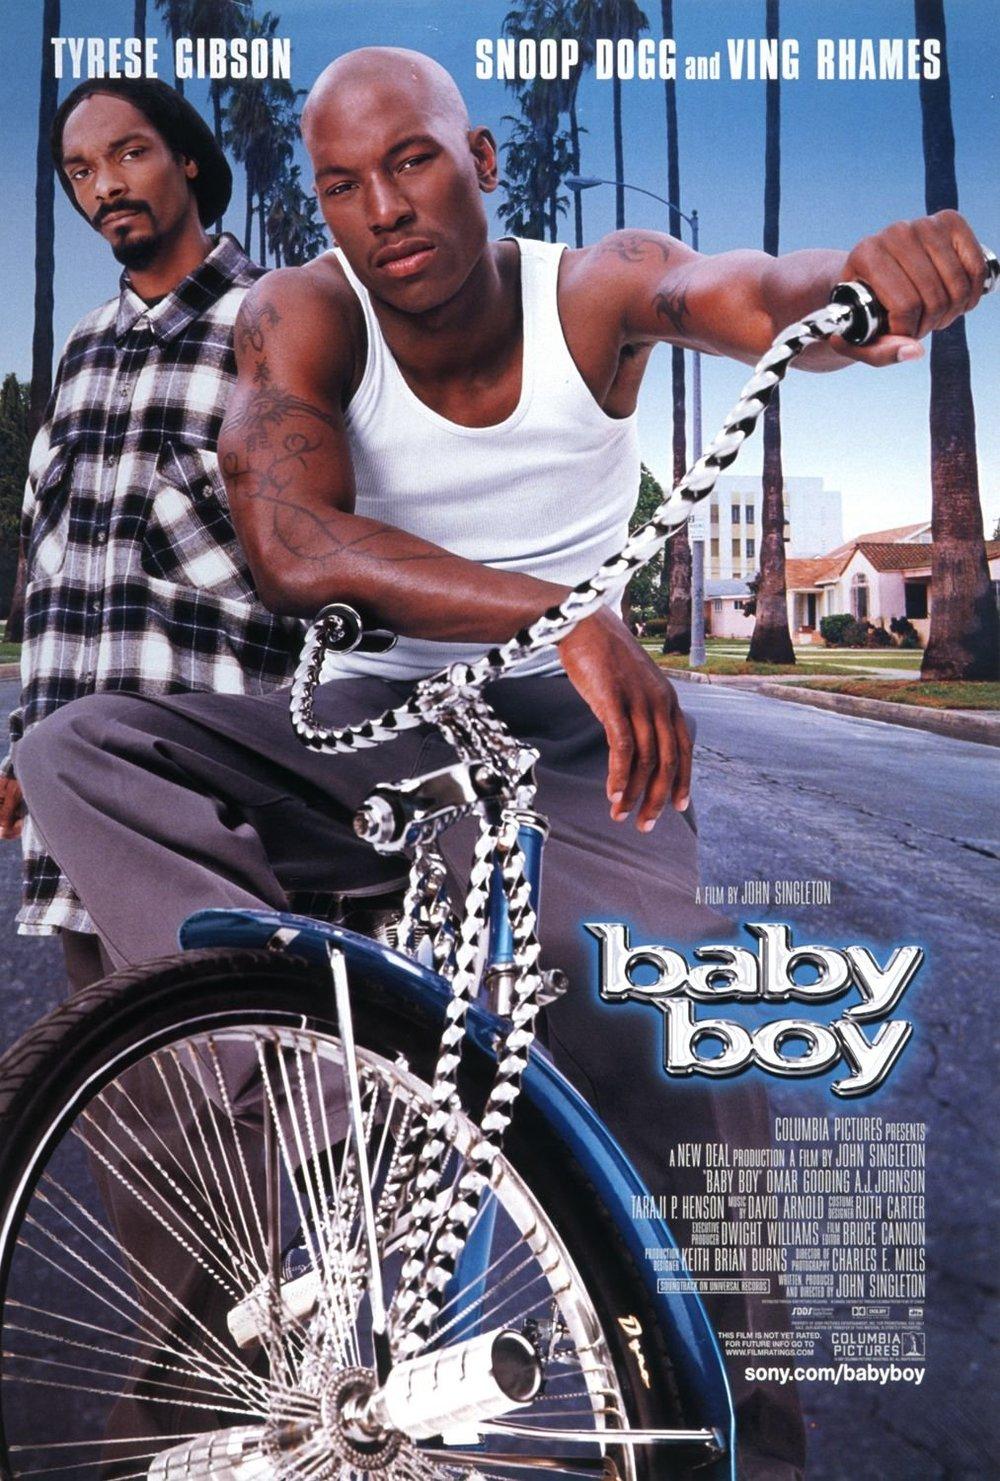 baby-boy-2001-us-poster.jpg